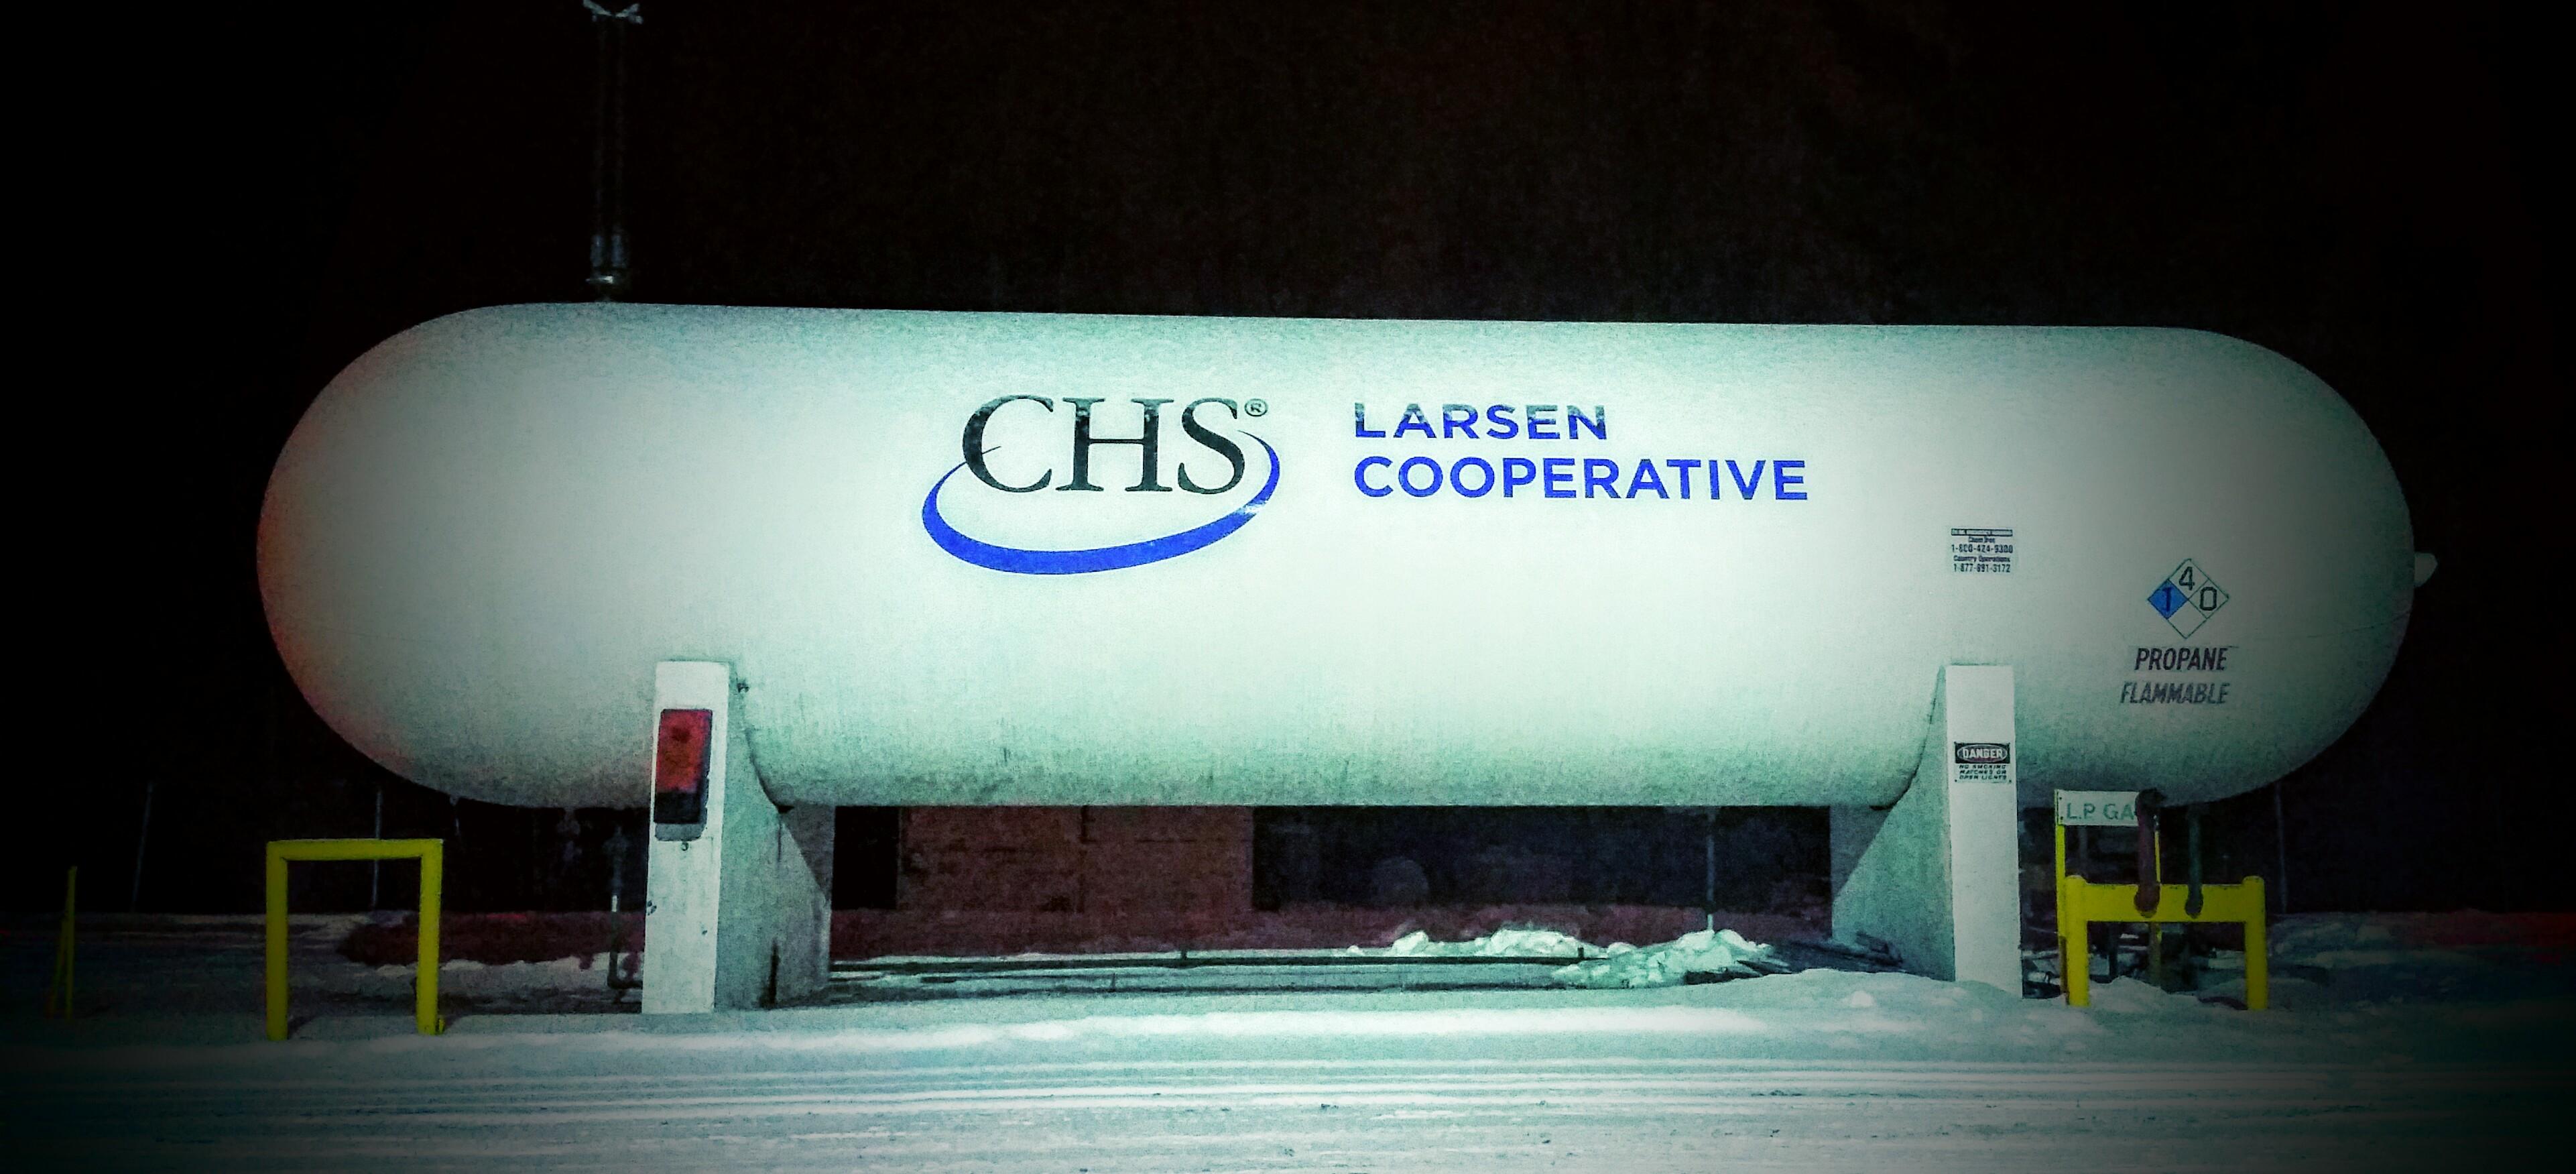 CHS Larsen Cooperative image 3